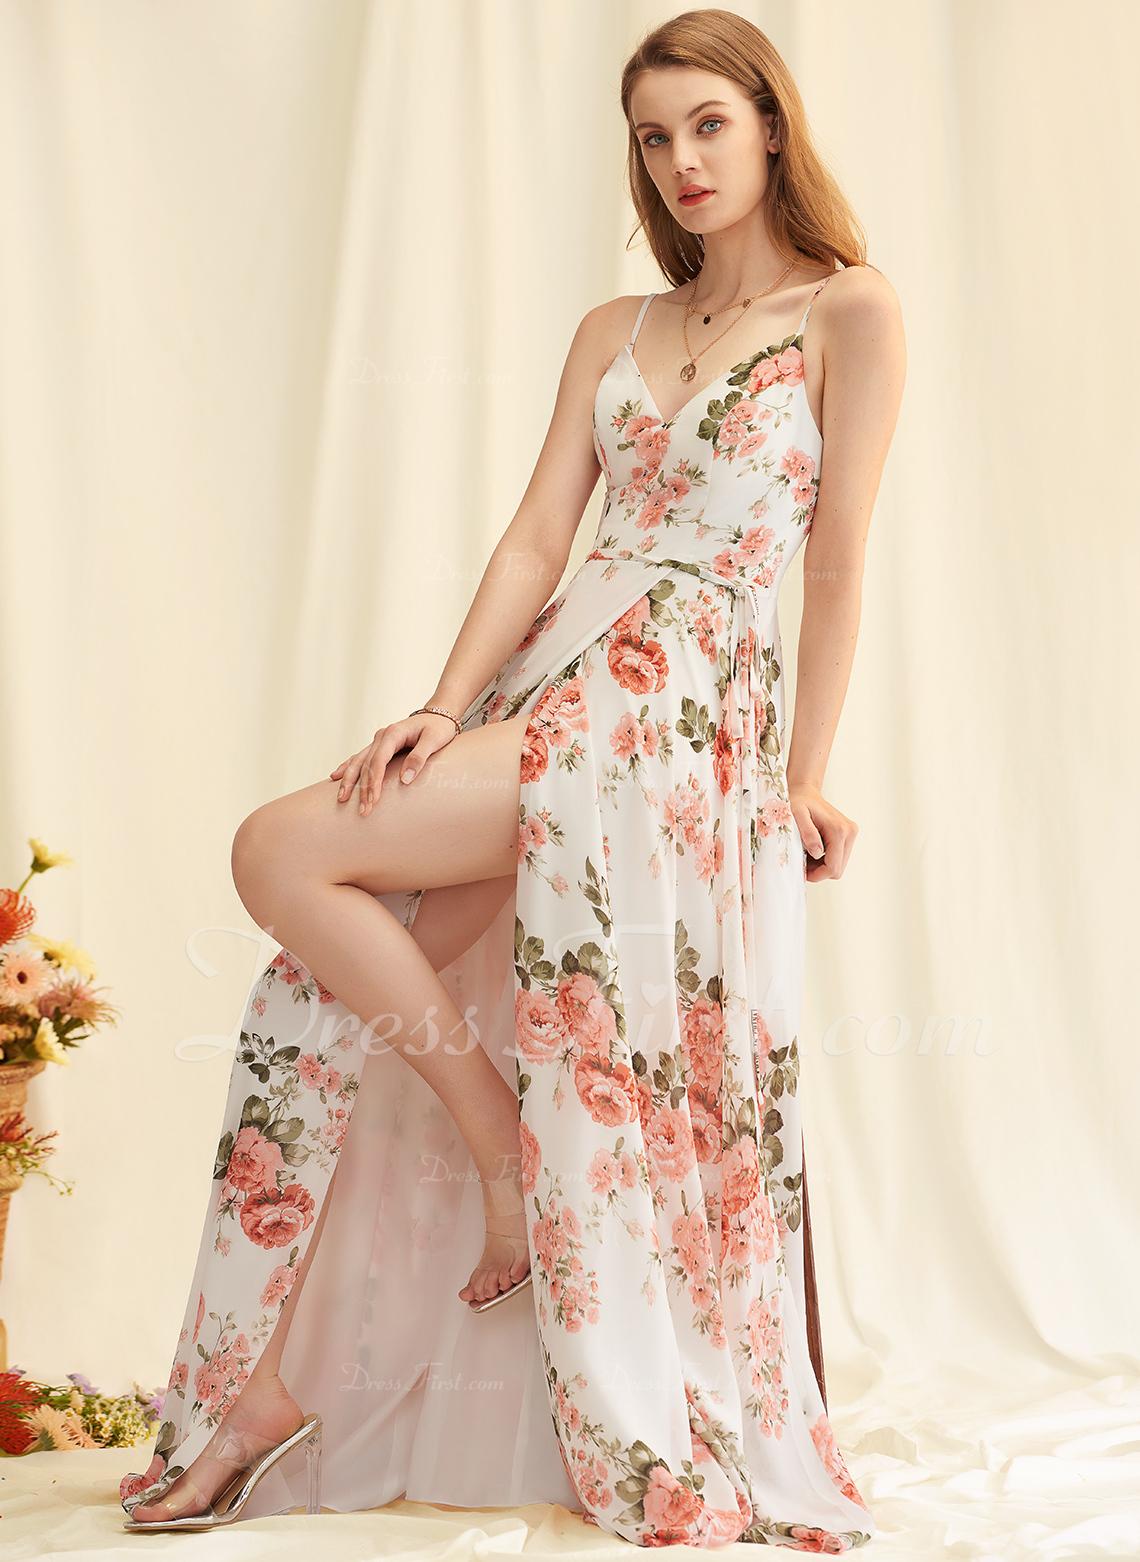 V-neck Other Colors Chiffon Dresses